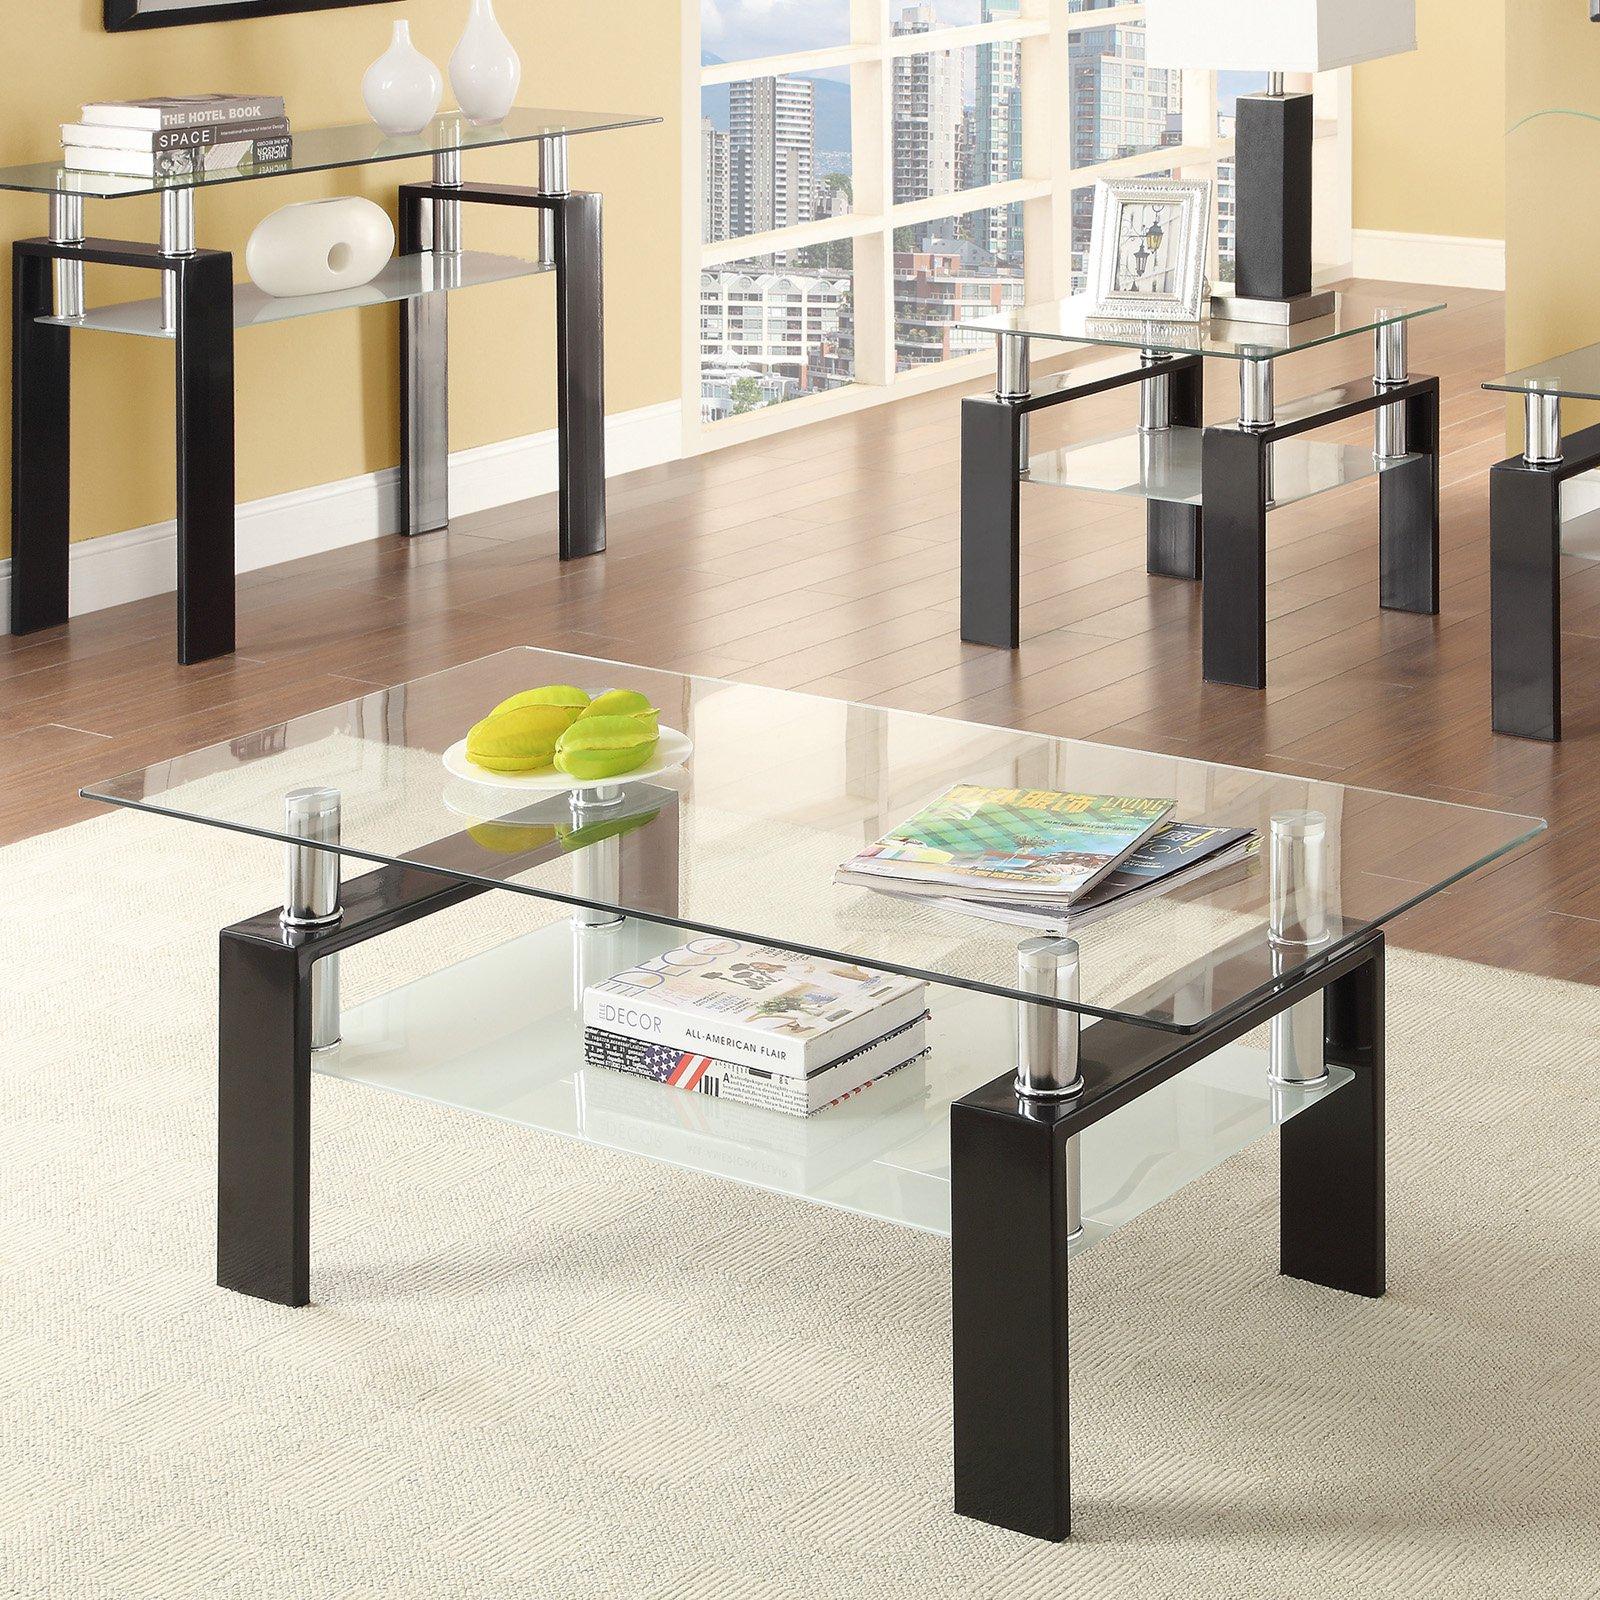 Coaster Furniture Glass Top Coffee Table with Shelf - Chrome